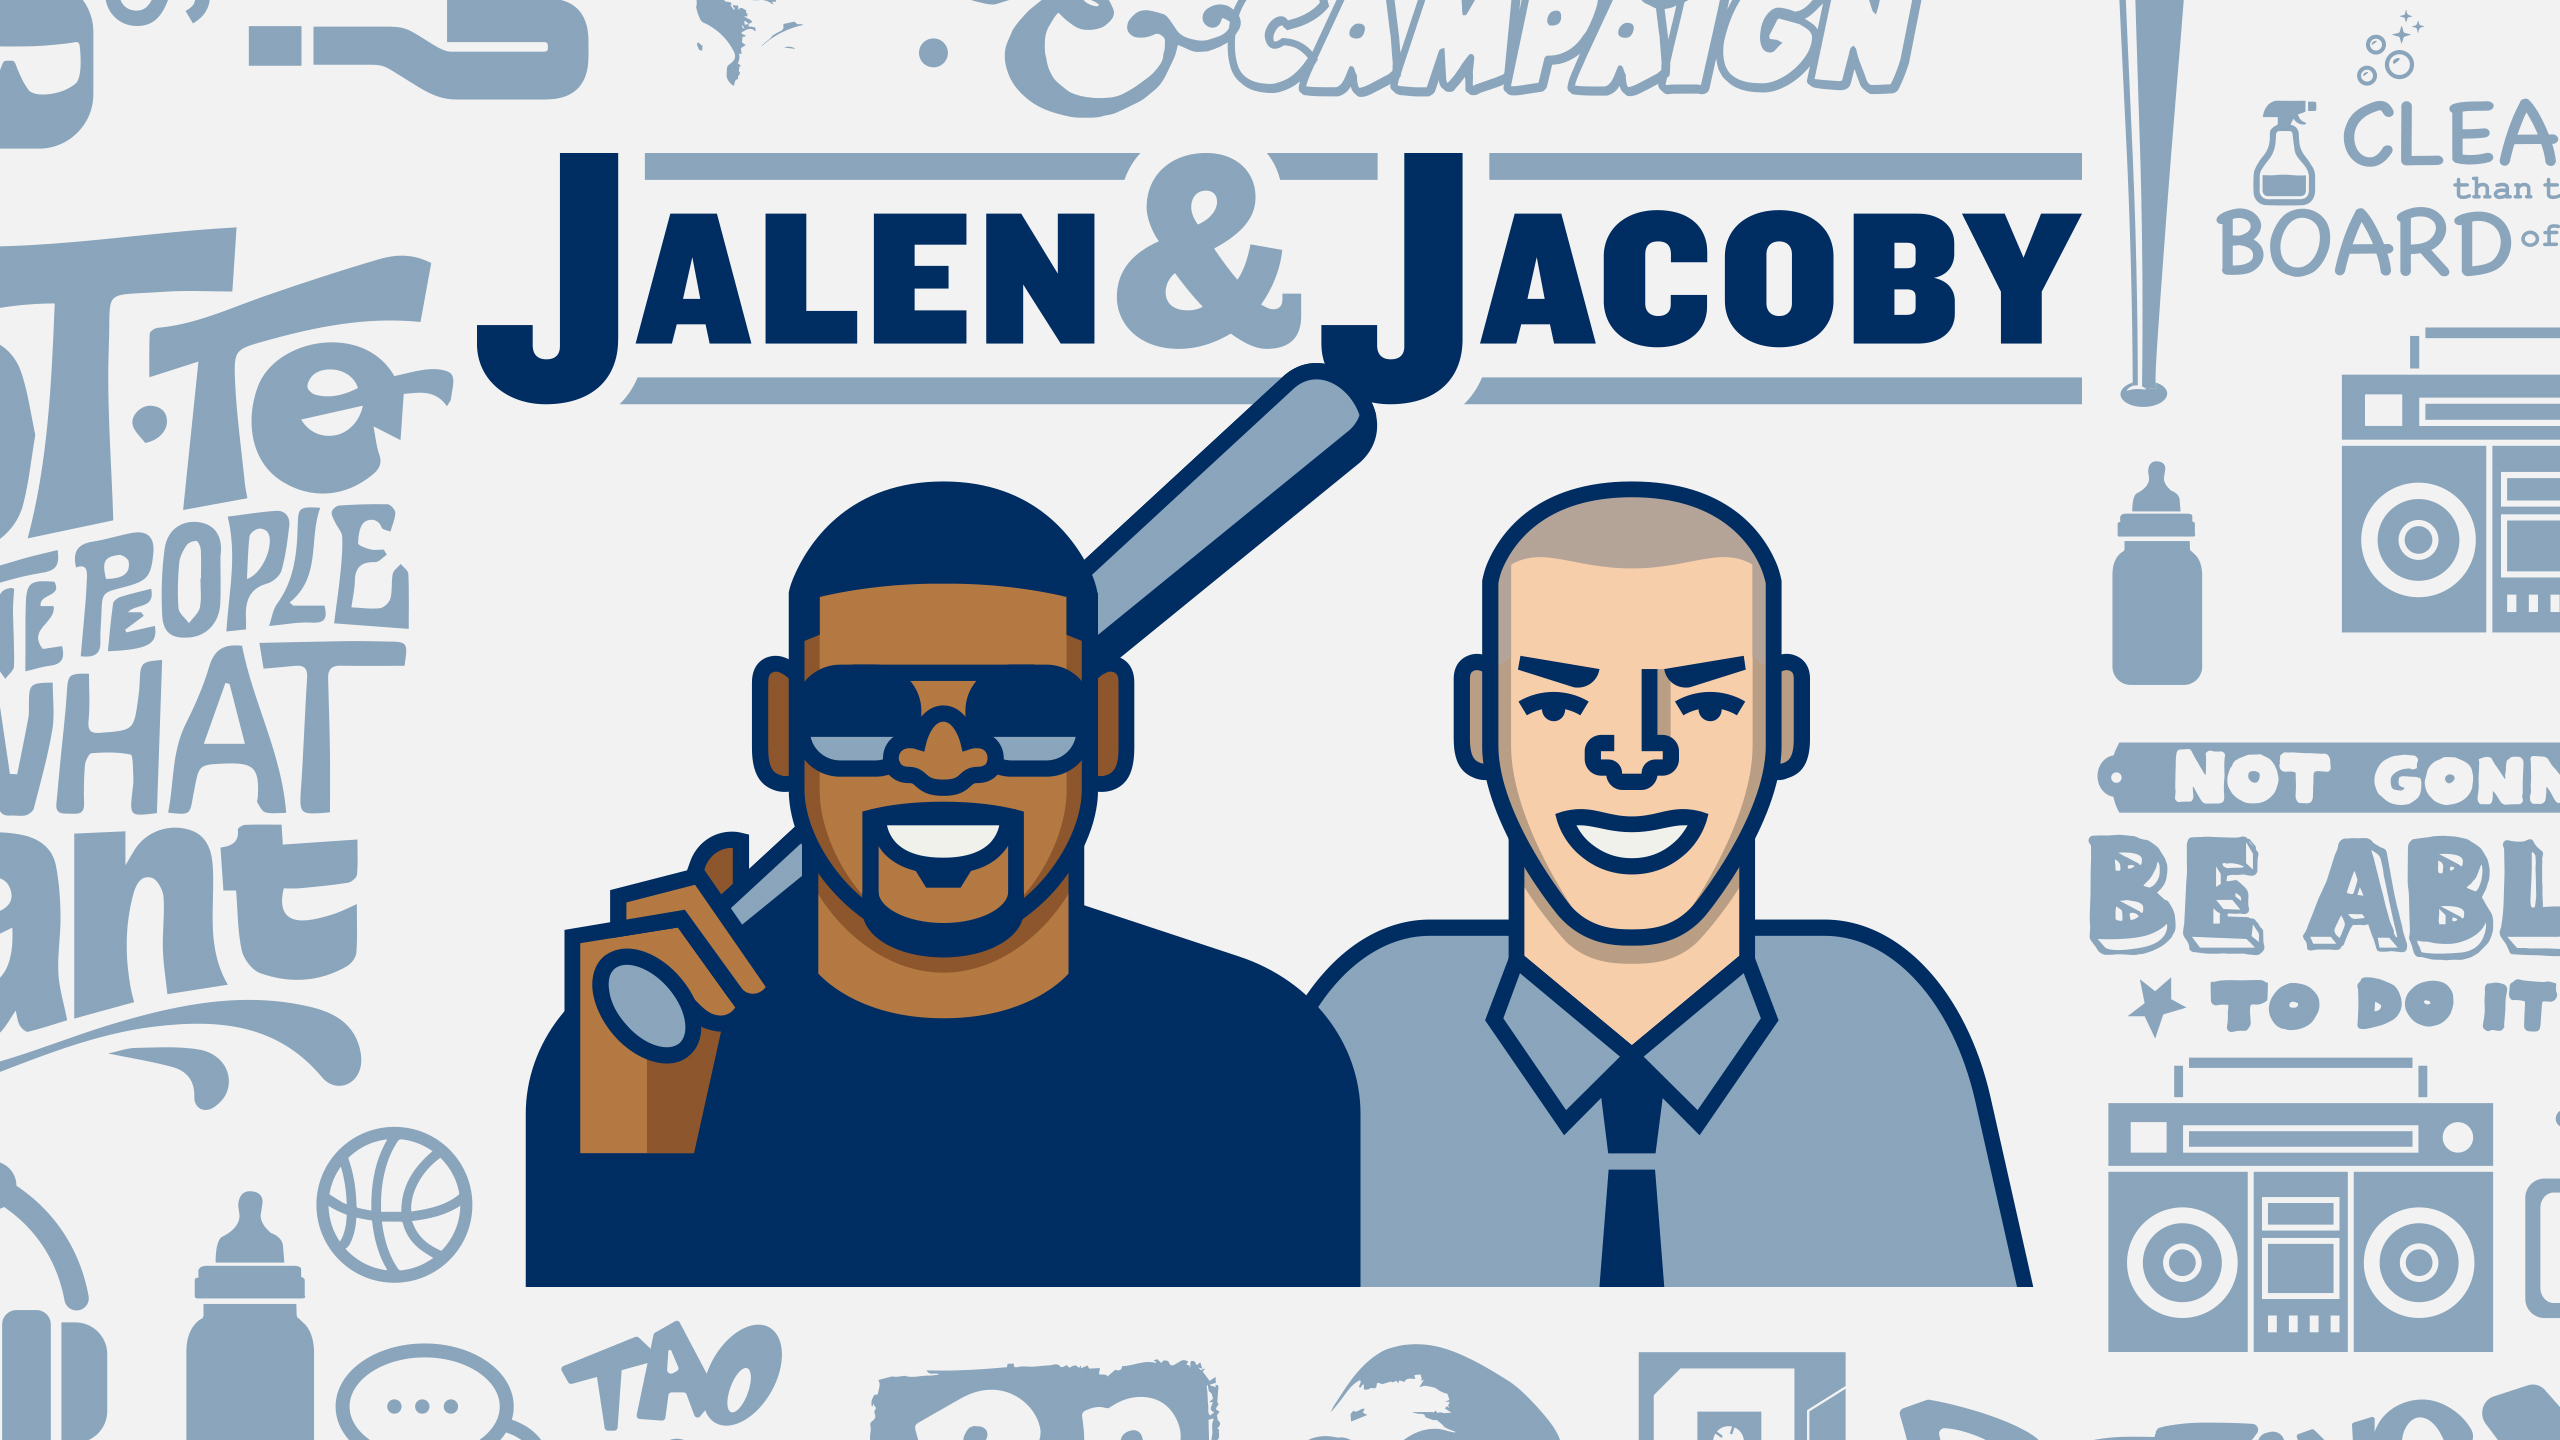 Mon, 3/18 - Jalen & Jacoby